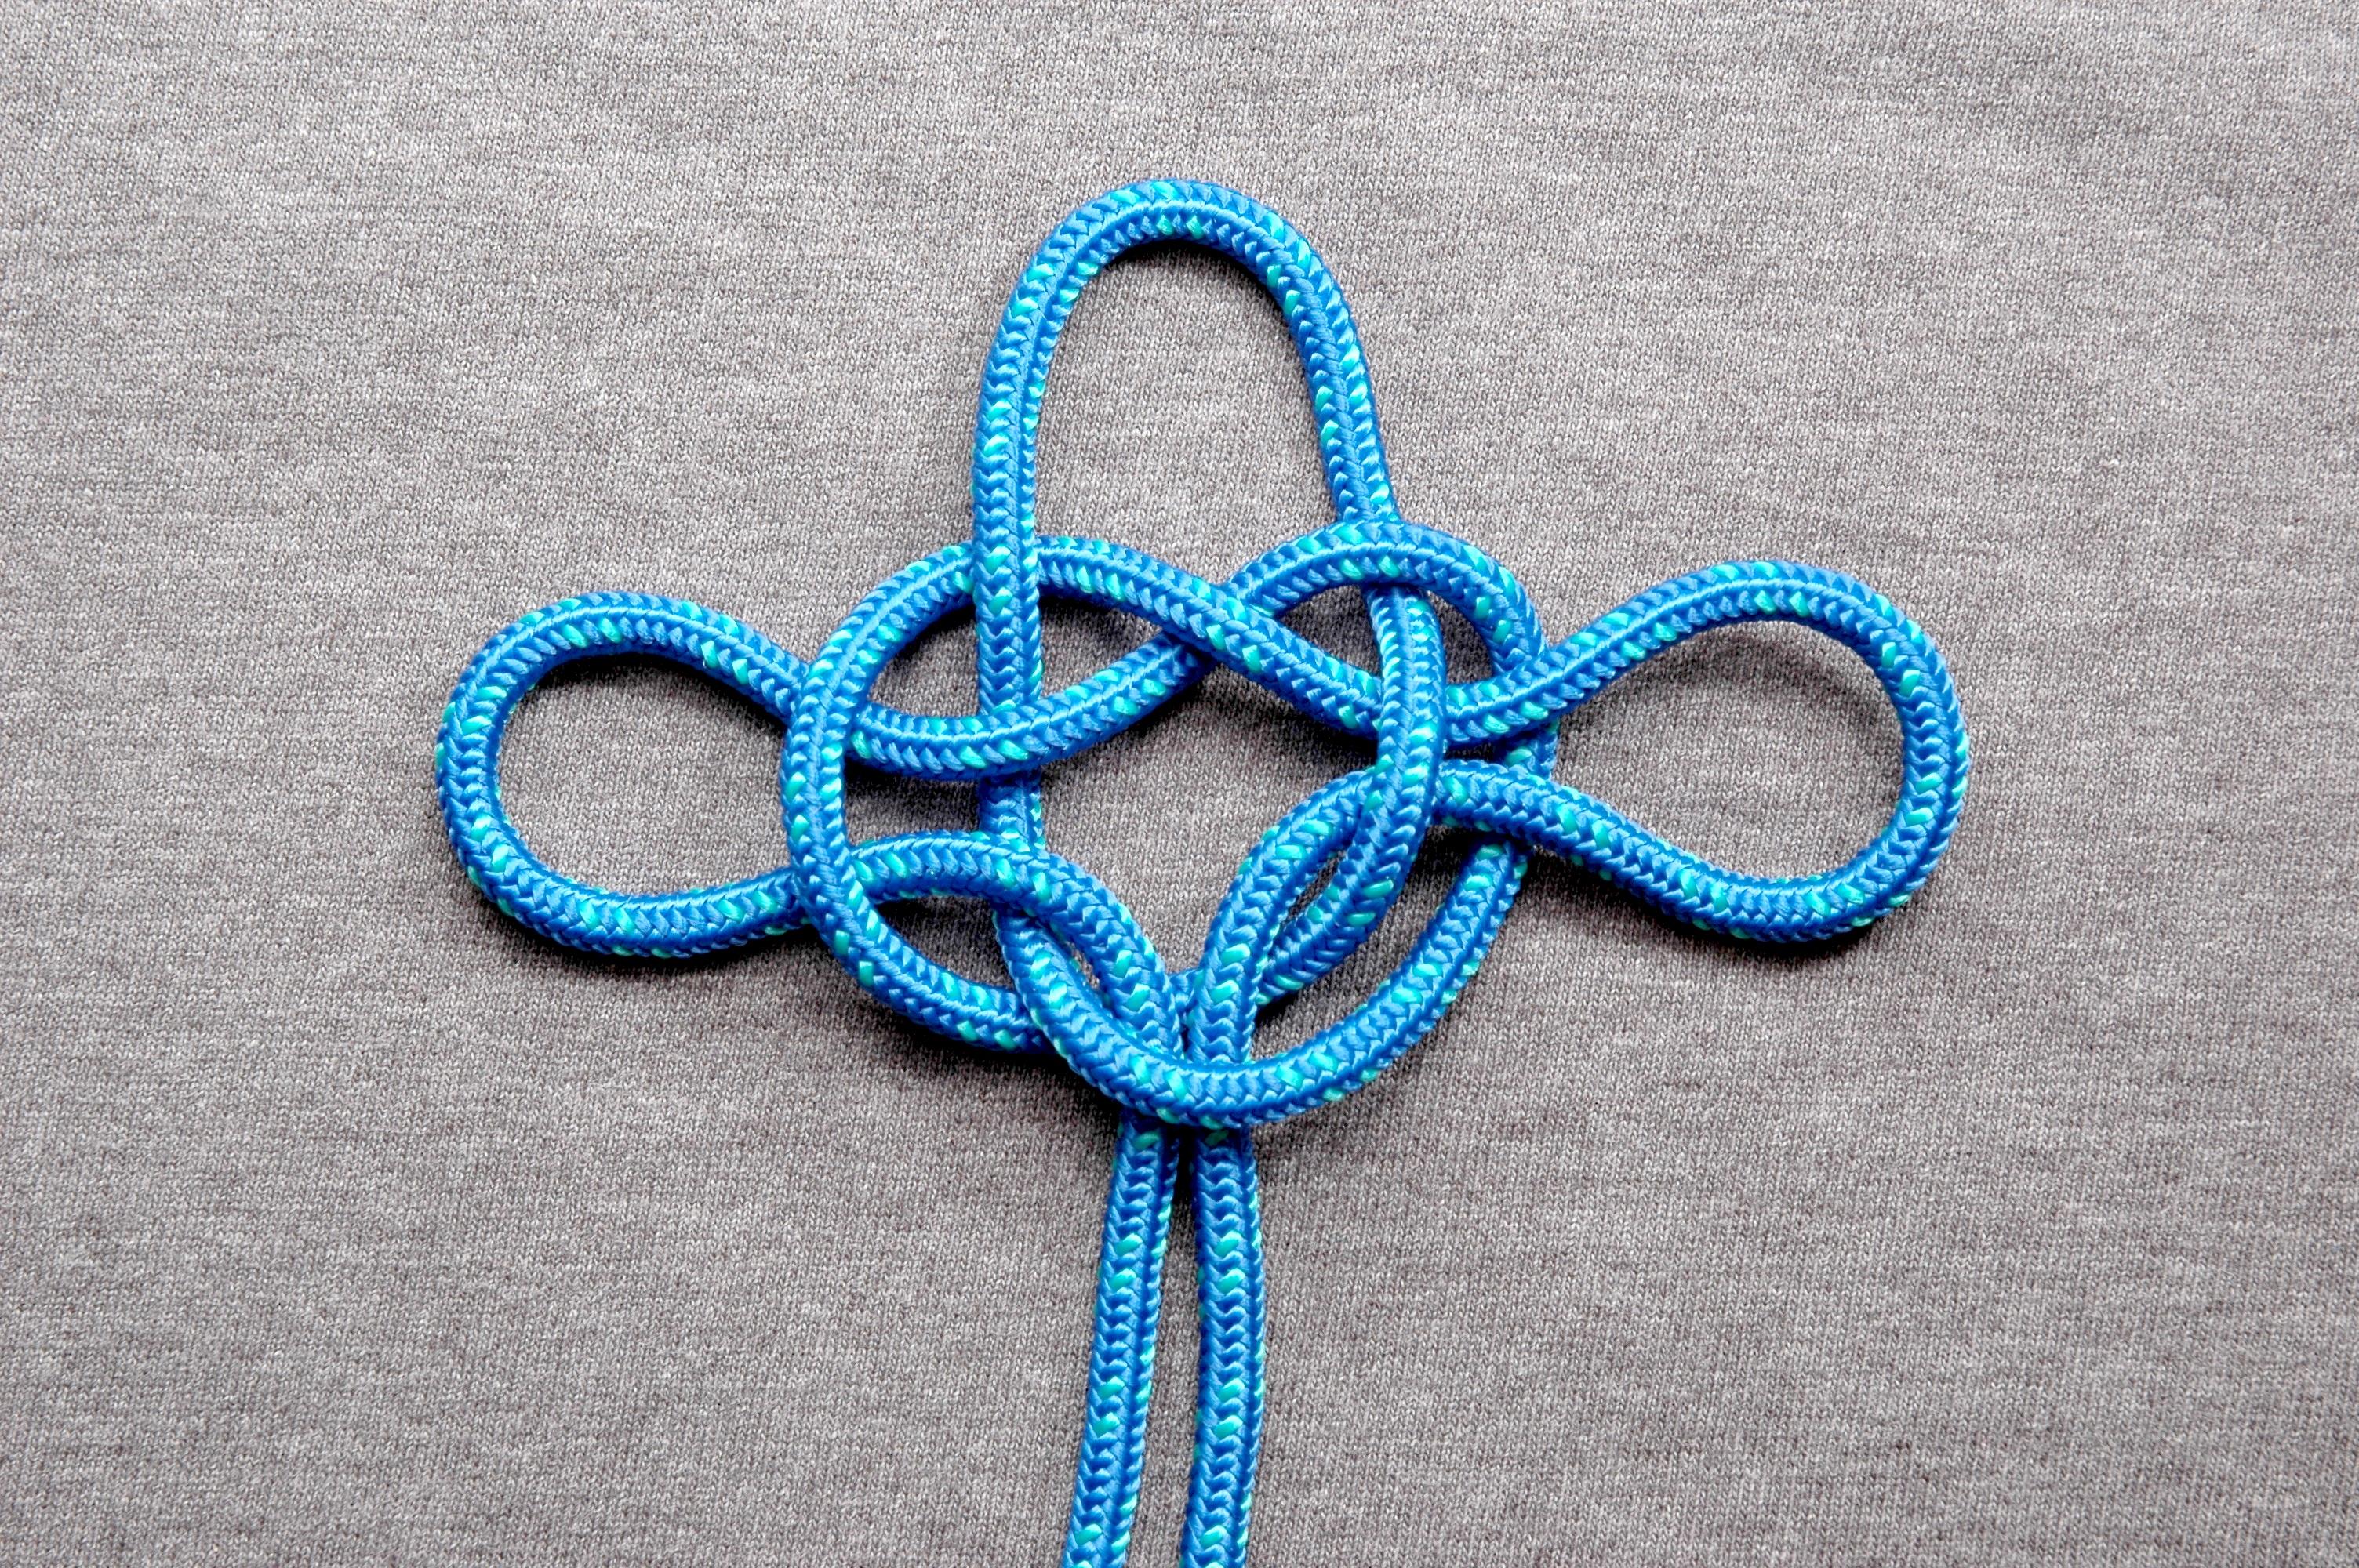 Jury-mast-knot-ABOK-1168.jpg